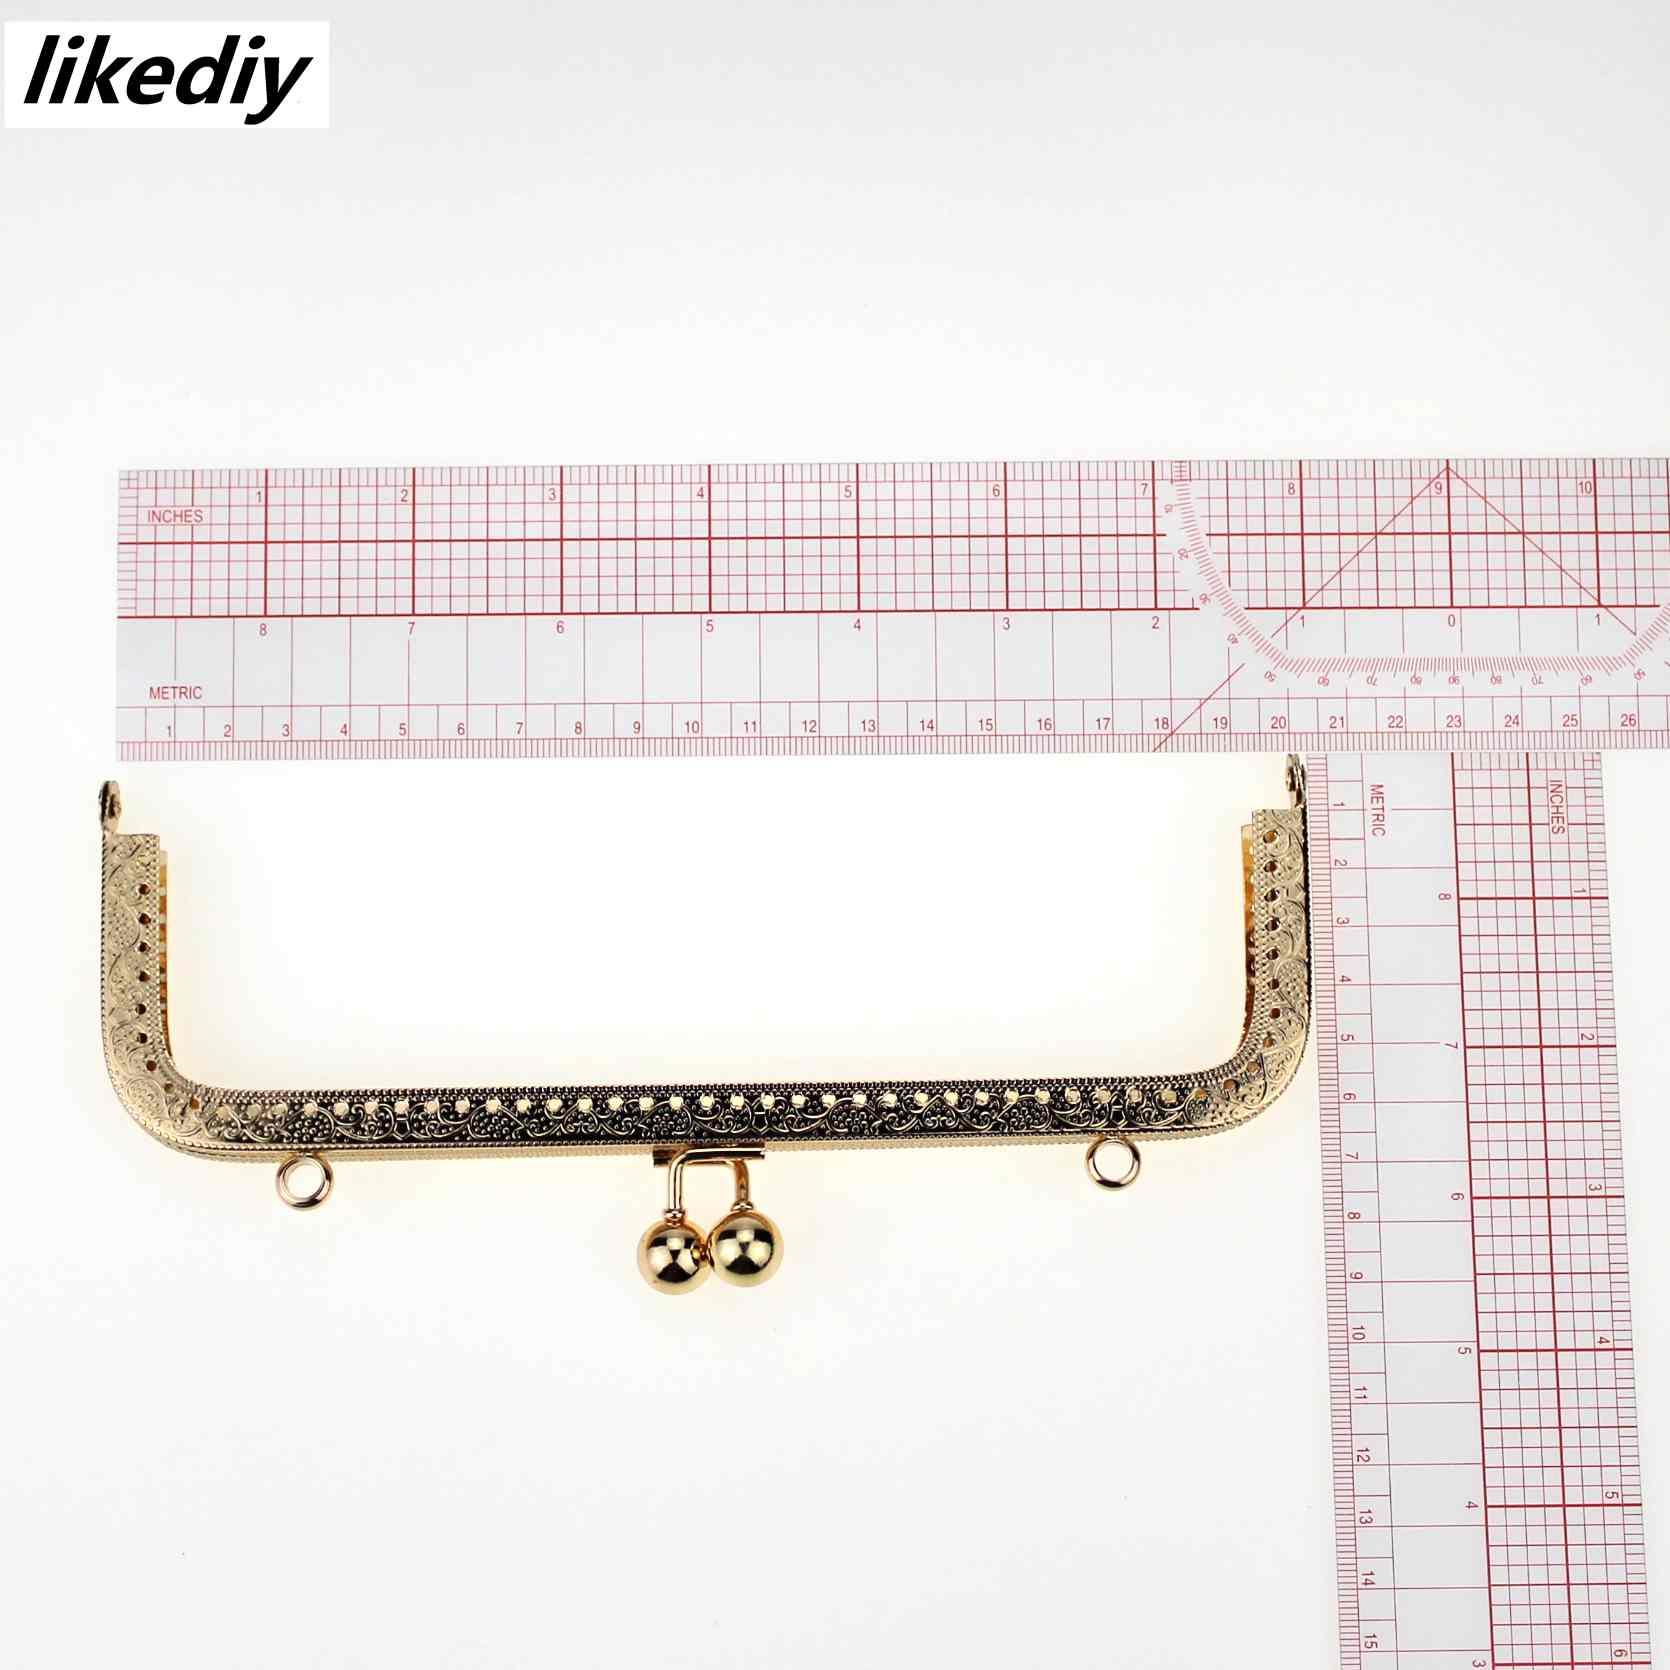 Image 2 - 5 pcs/lot 20 cm large size square embossing metal purse frame Kiss clasp bead head DIY bag accessory 5 colorsBag Parts & Accessories   -